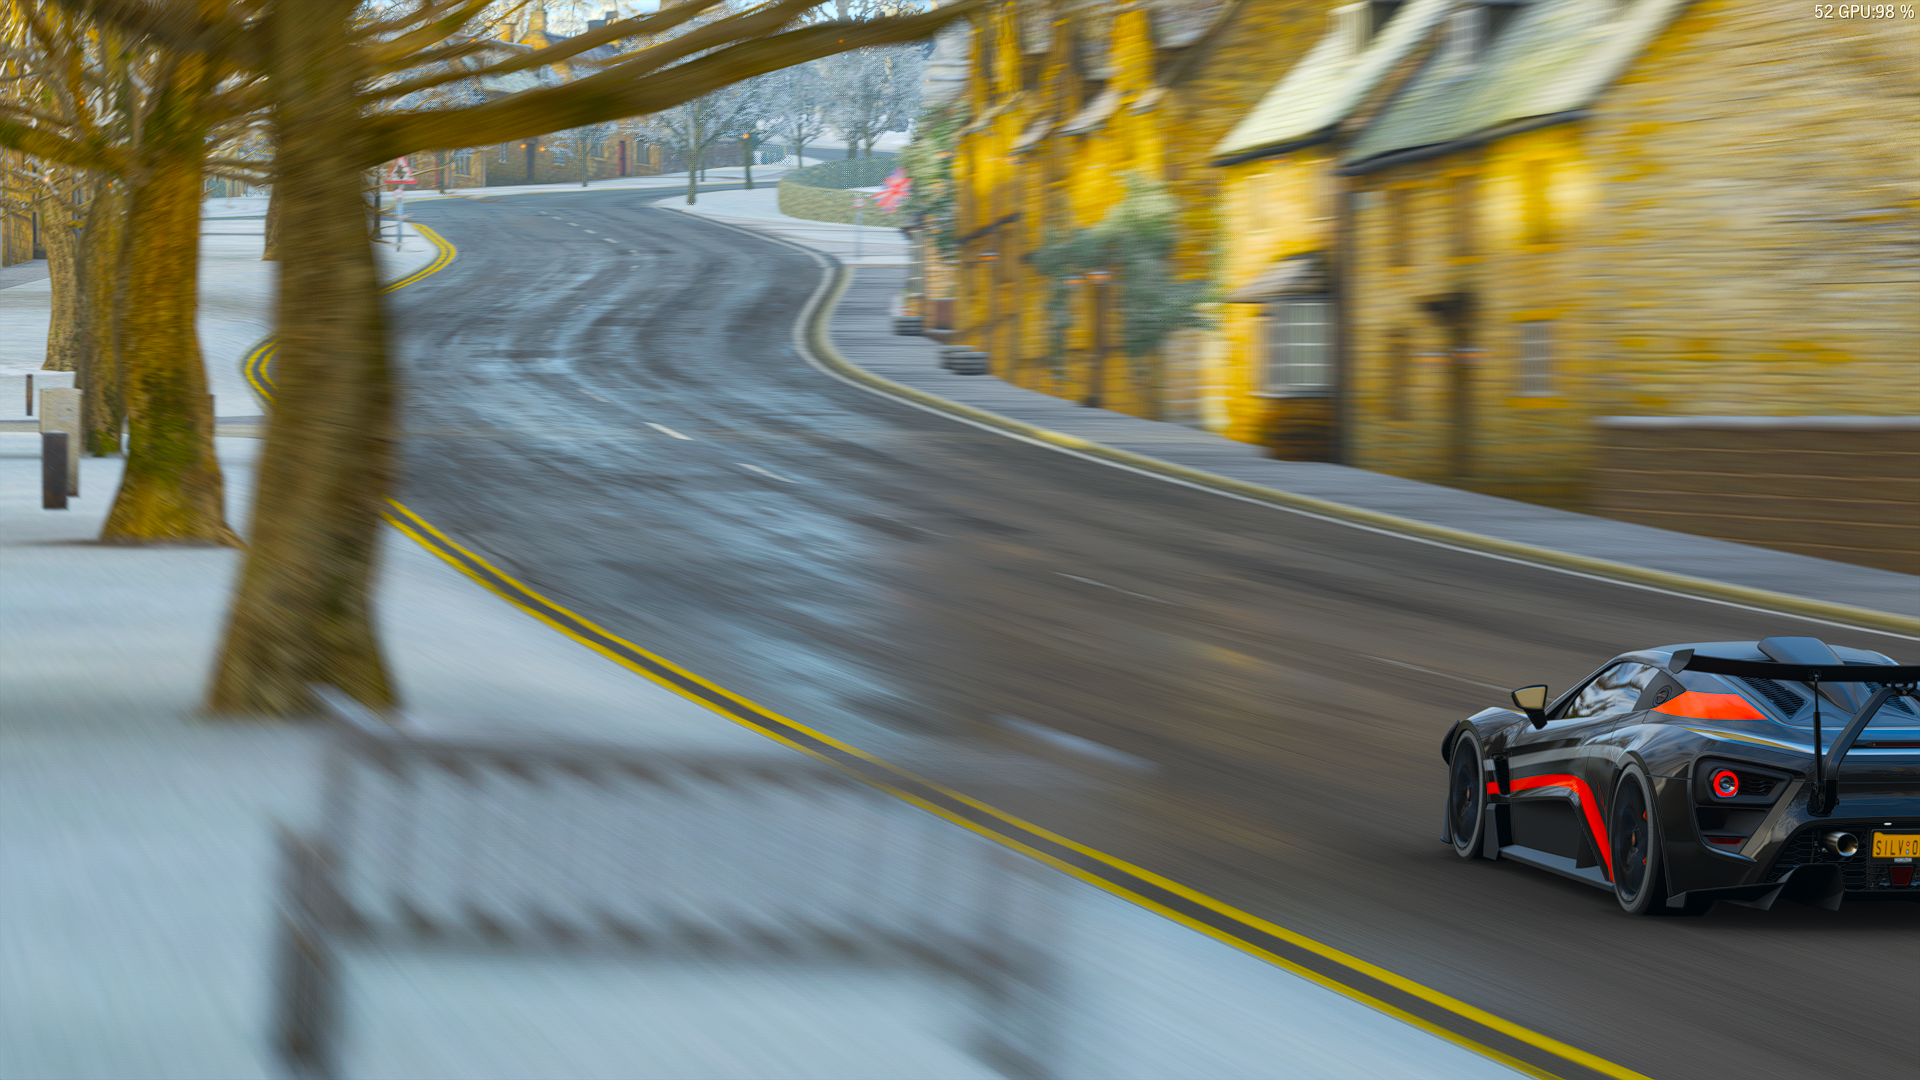 Forza Forza Horizon 4 Supercars Zenvo Zenvo Automotive 1920x1080